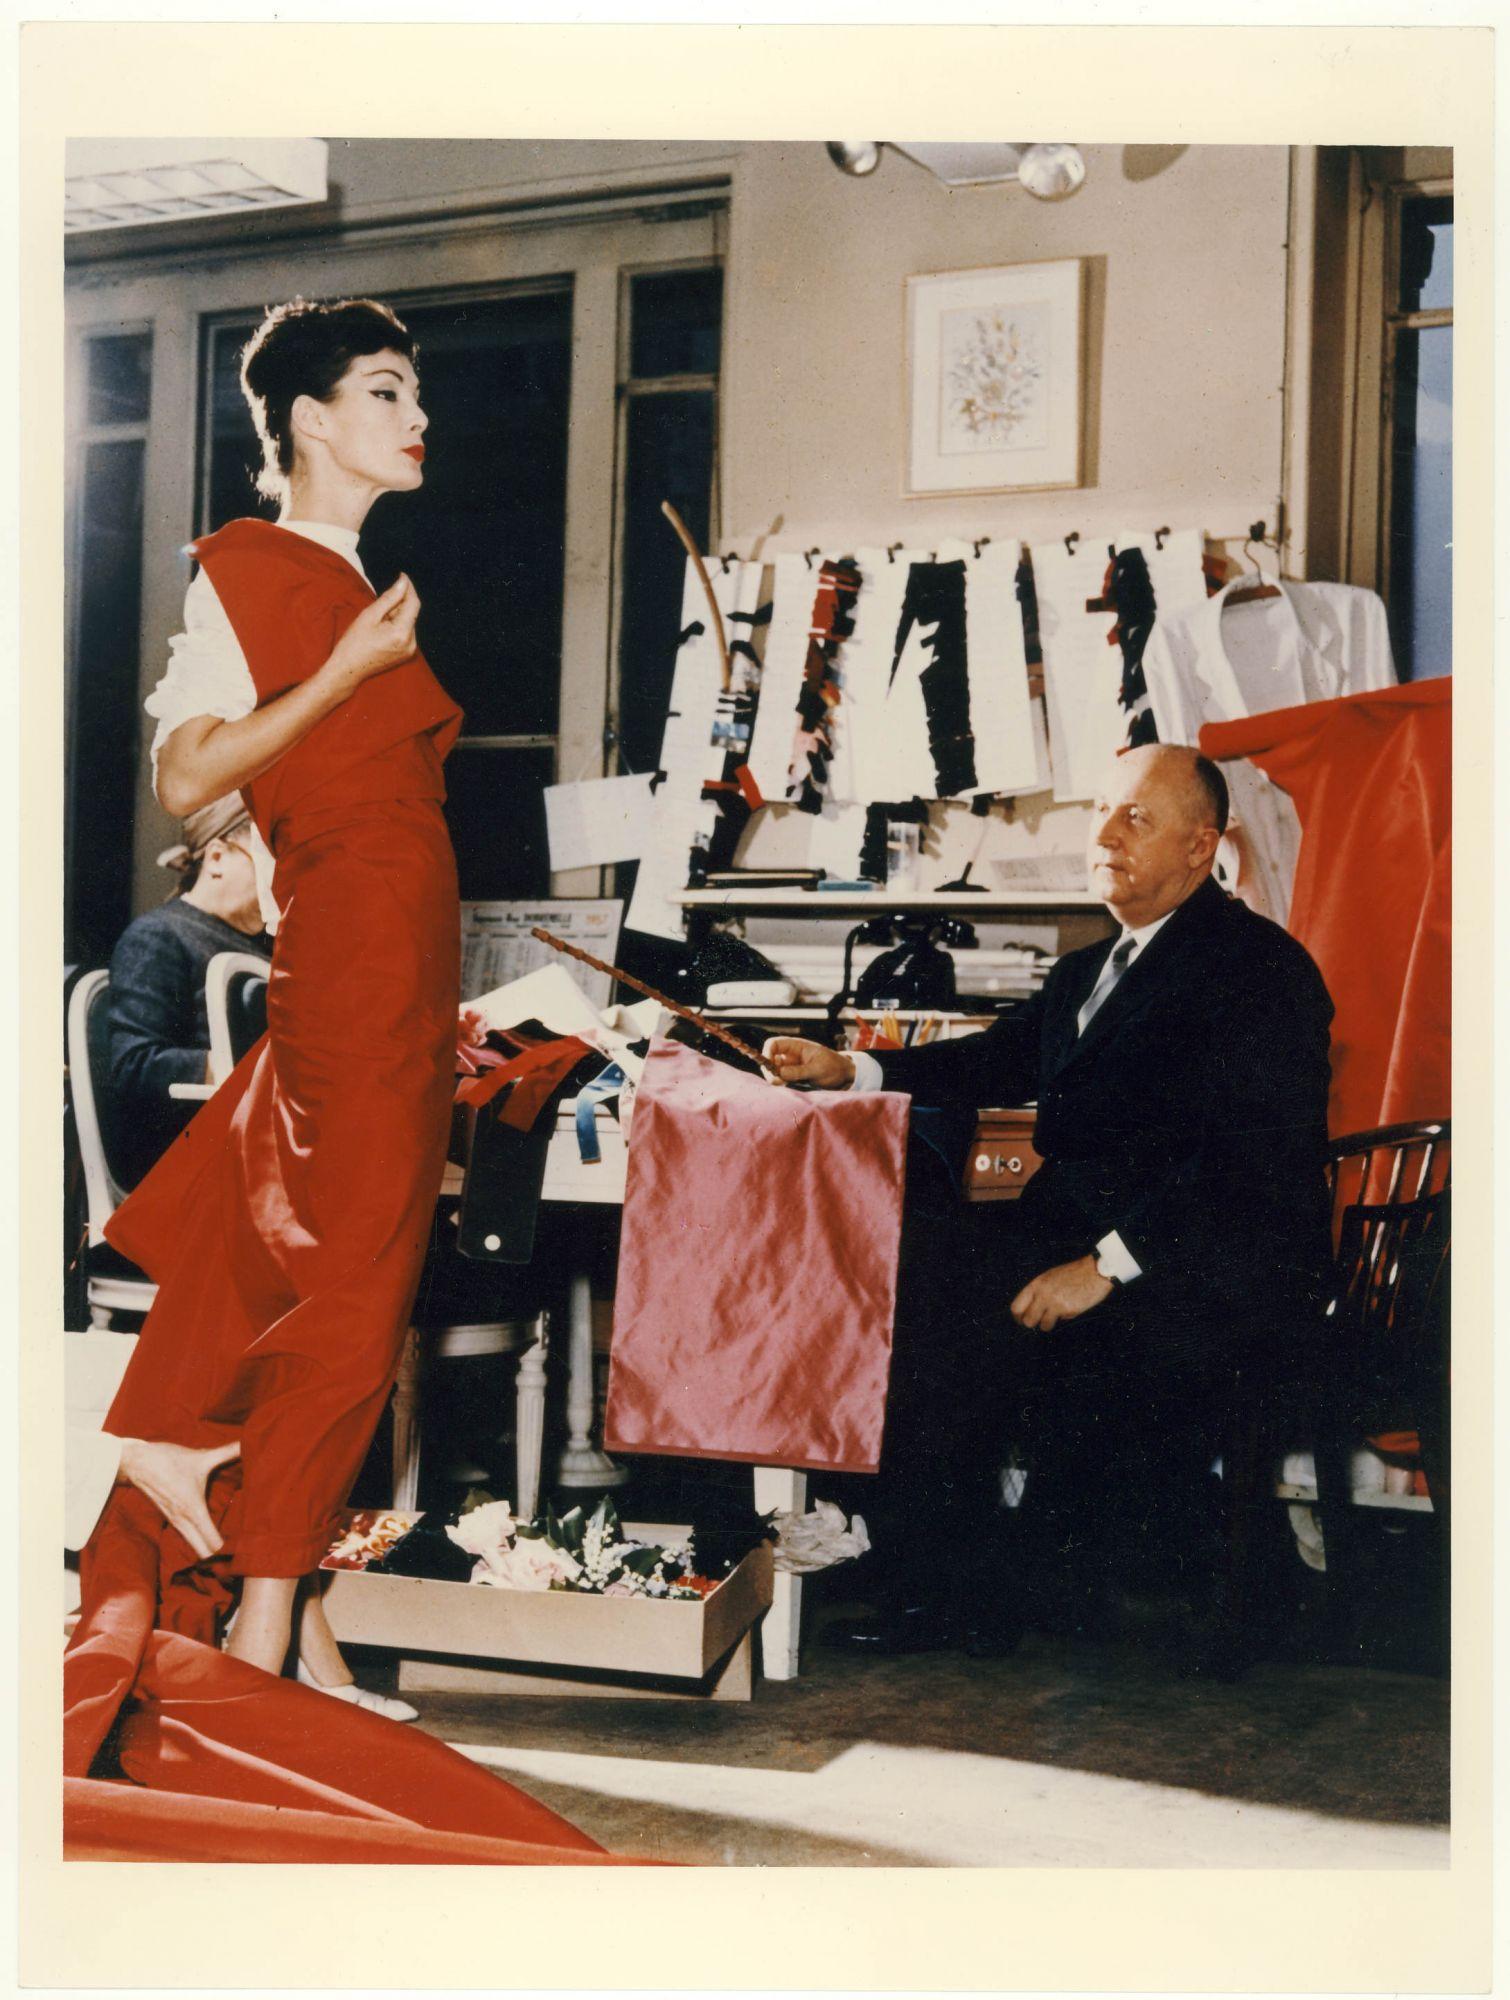 Christian Dior with model Lucky, circa 1955. (Photo: Courtesy of Christian Dior)